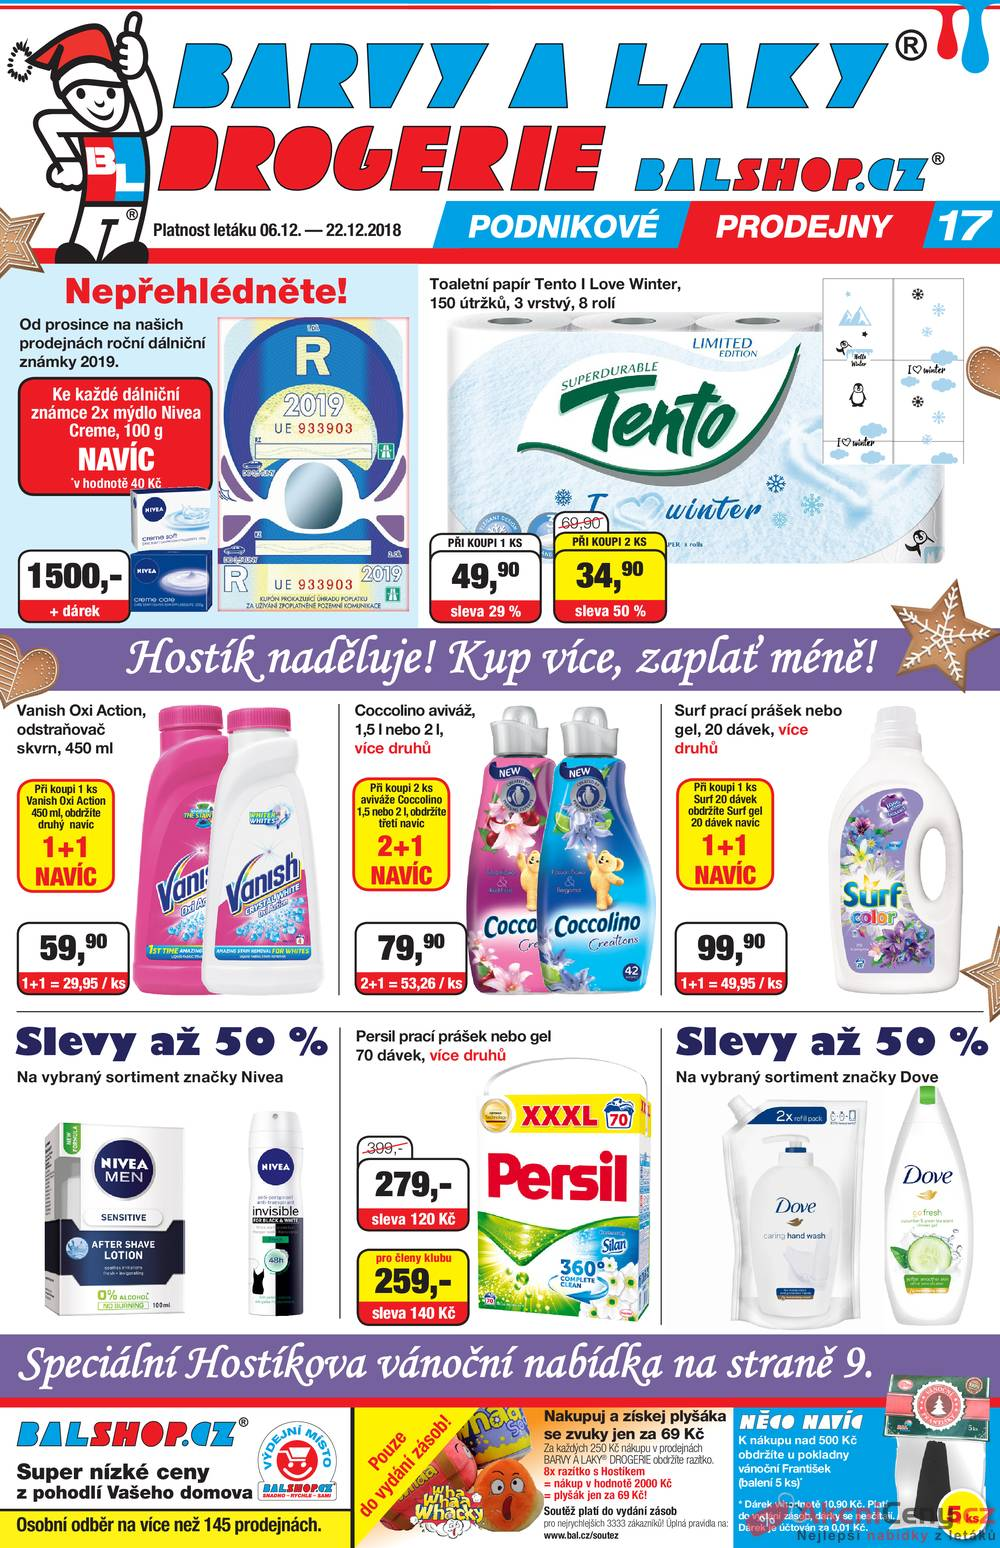 Leták Barvy a laky drogerie  - Barvy a laky drogerie 6.12. - 22.12. - strana 1